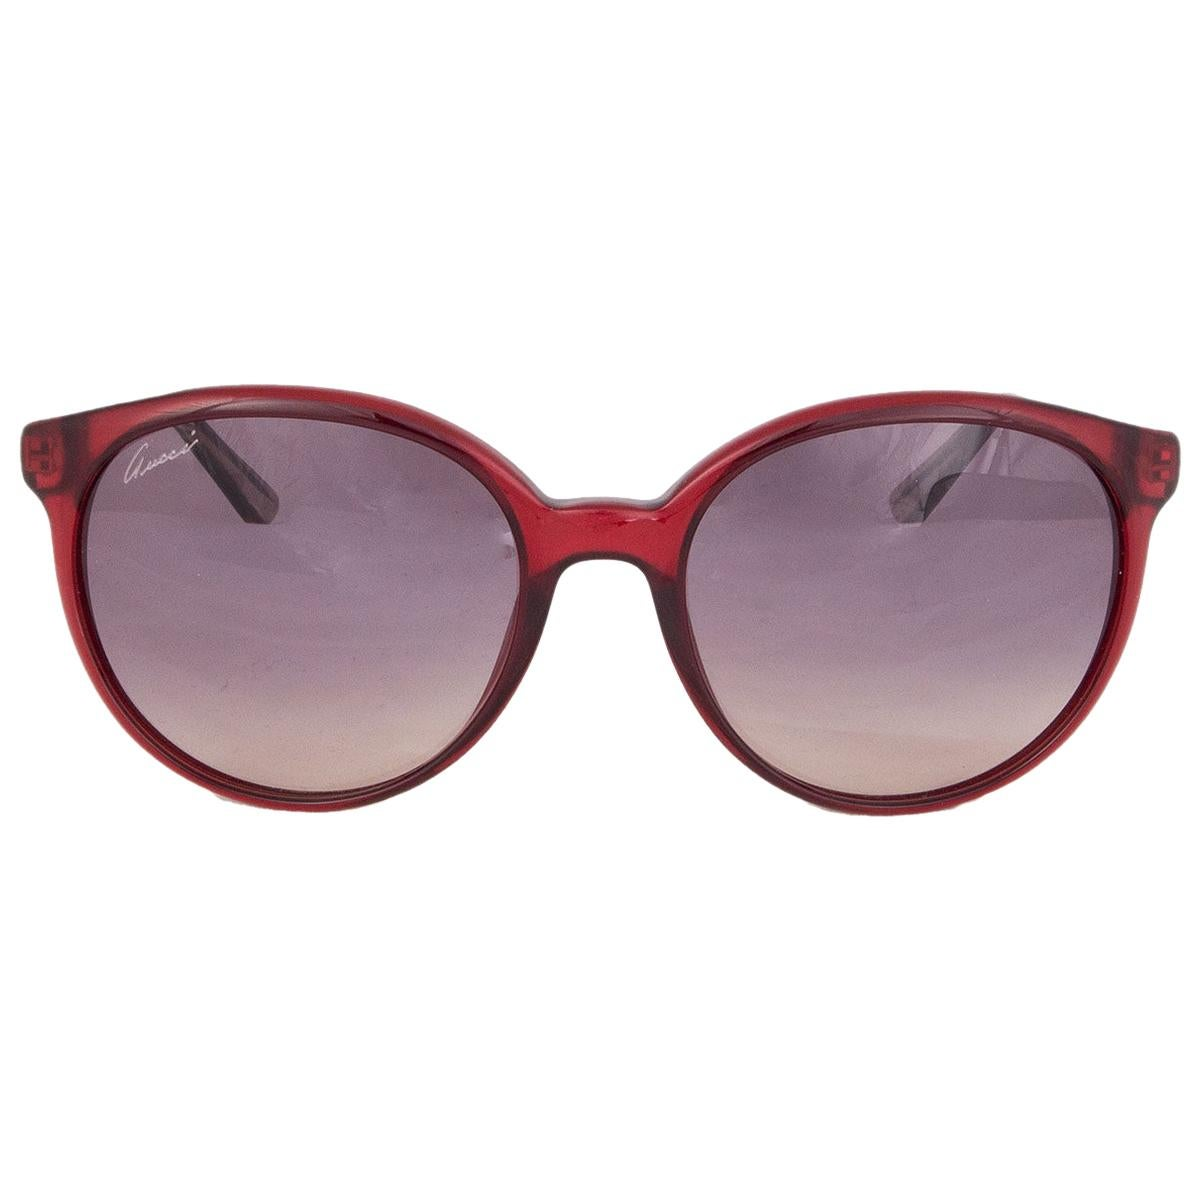 GUCCI burgundy Sunglasses gradient grey Lenses GG 3697/S